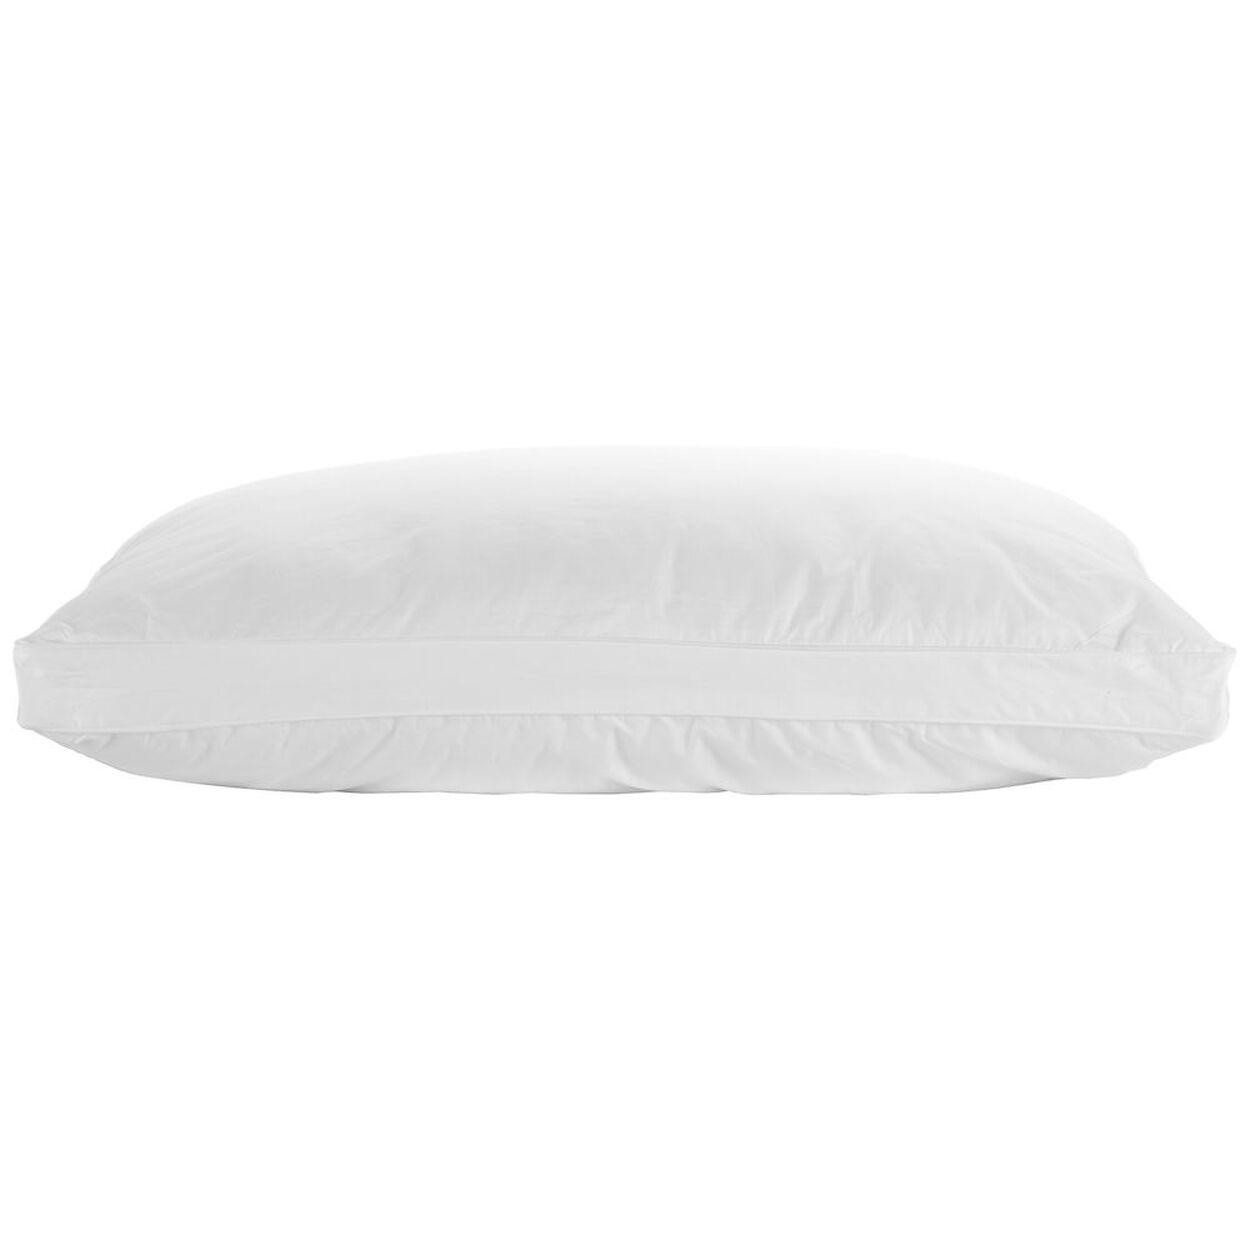 Microgel Fibre Pillow